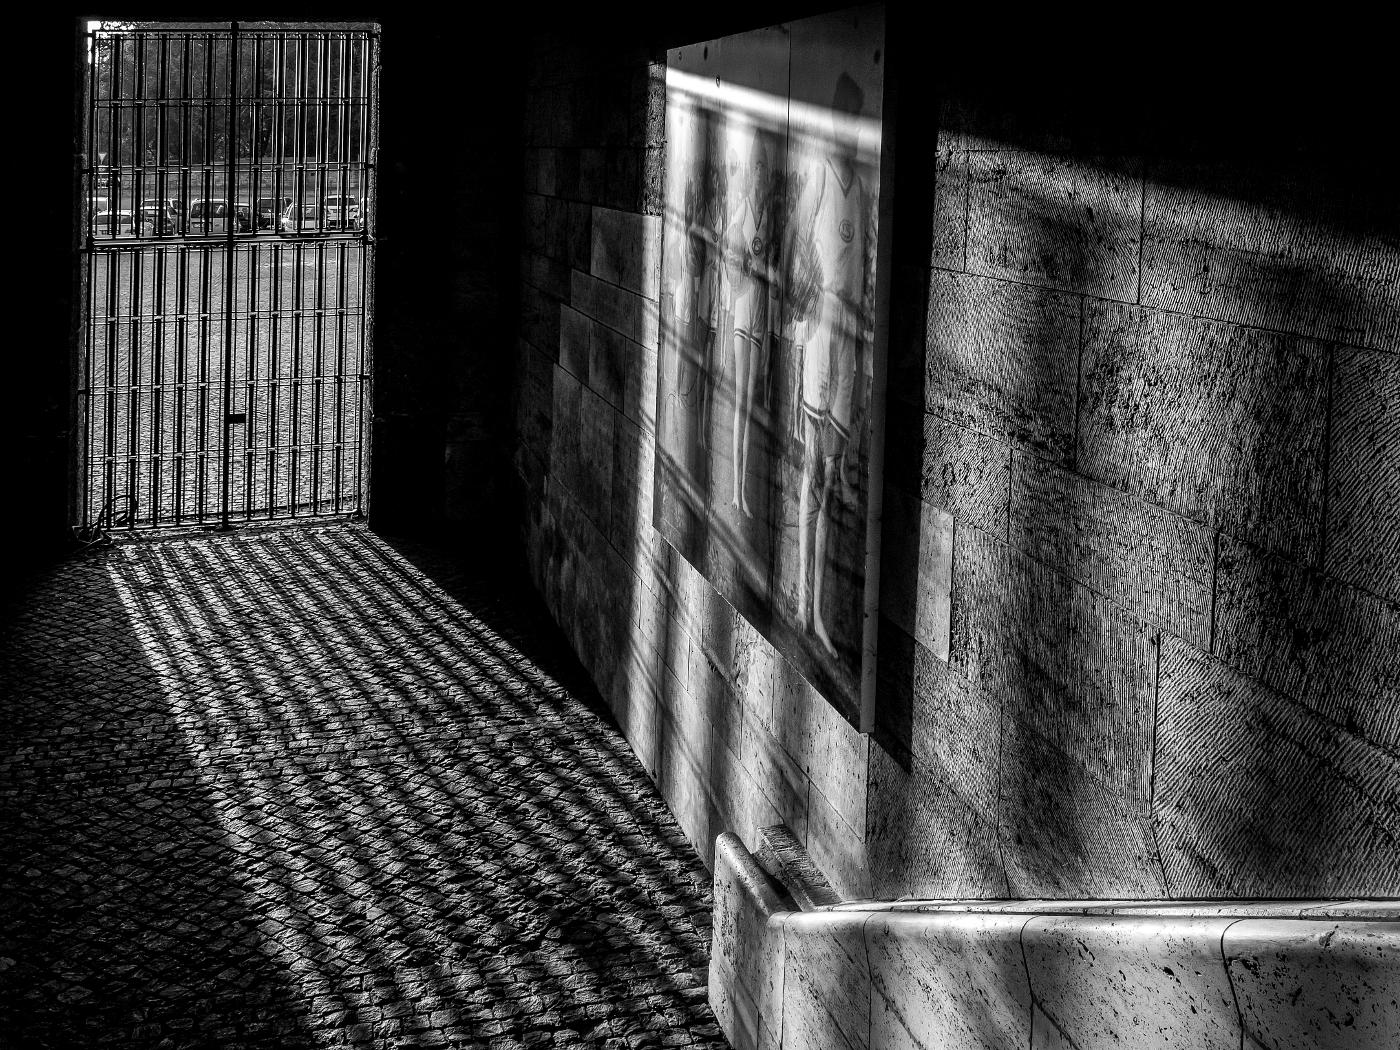 Olympia-Glockenturm # 04  | © wolfgang röser | worobo